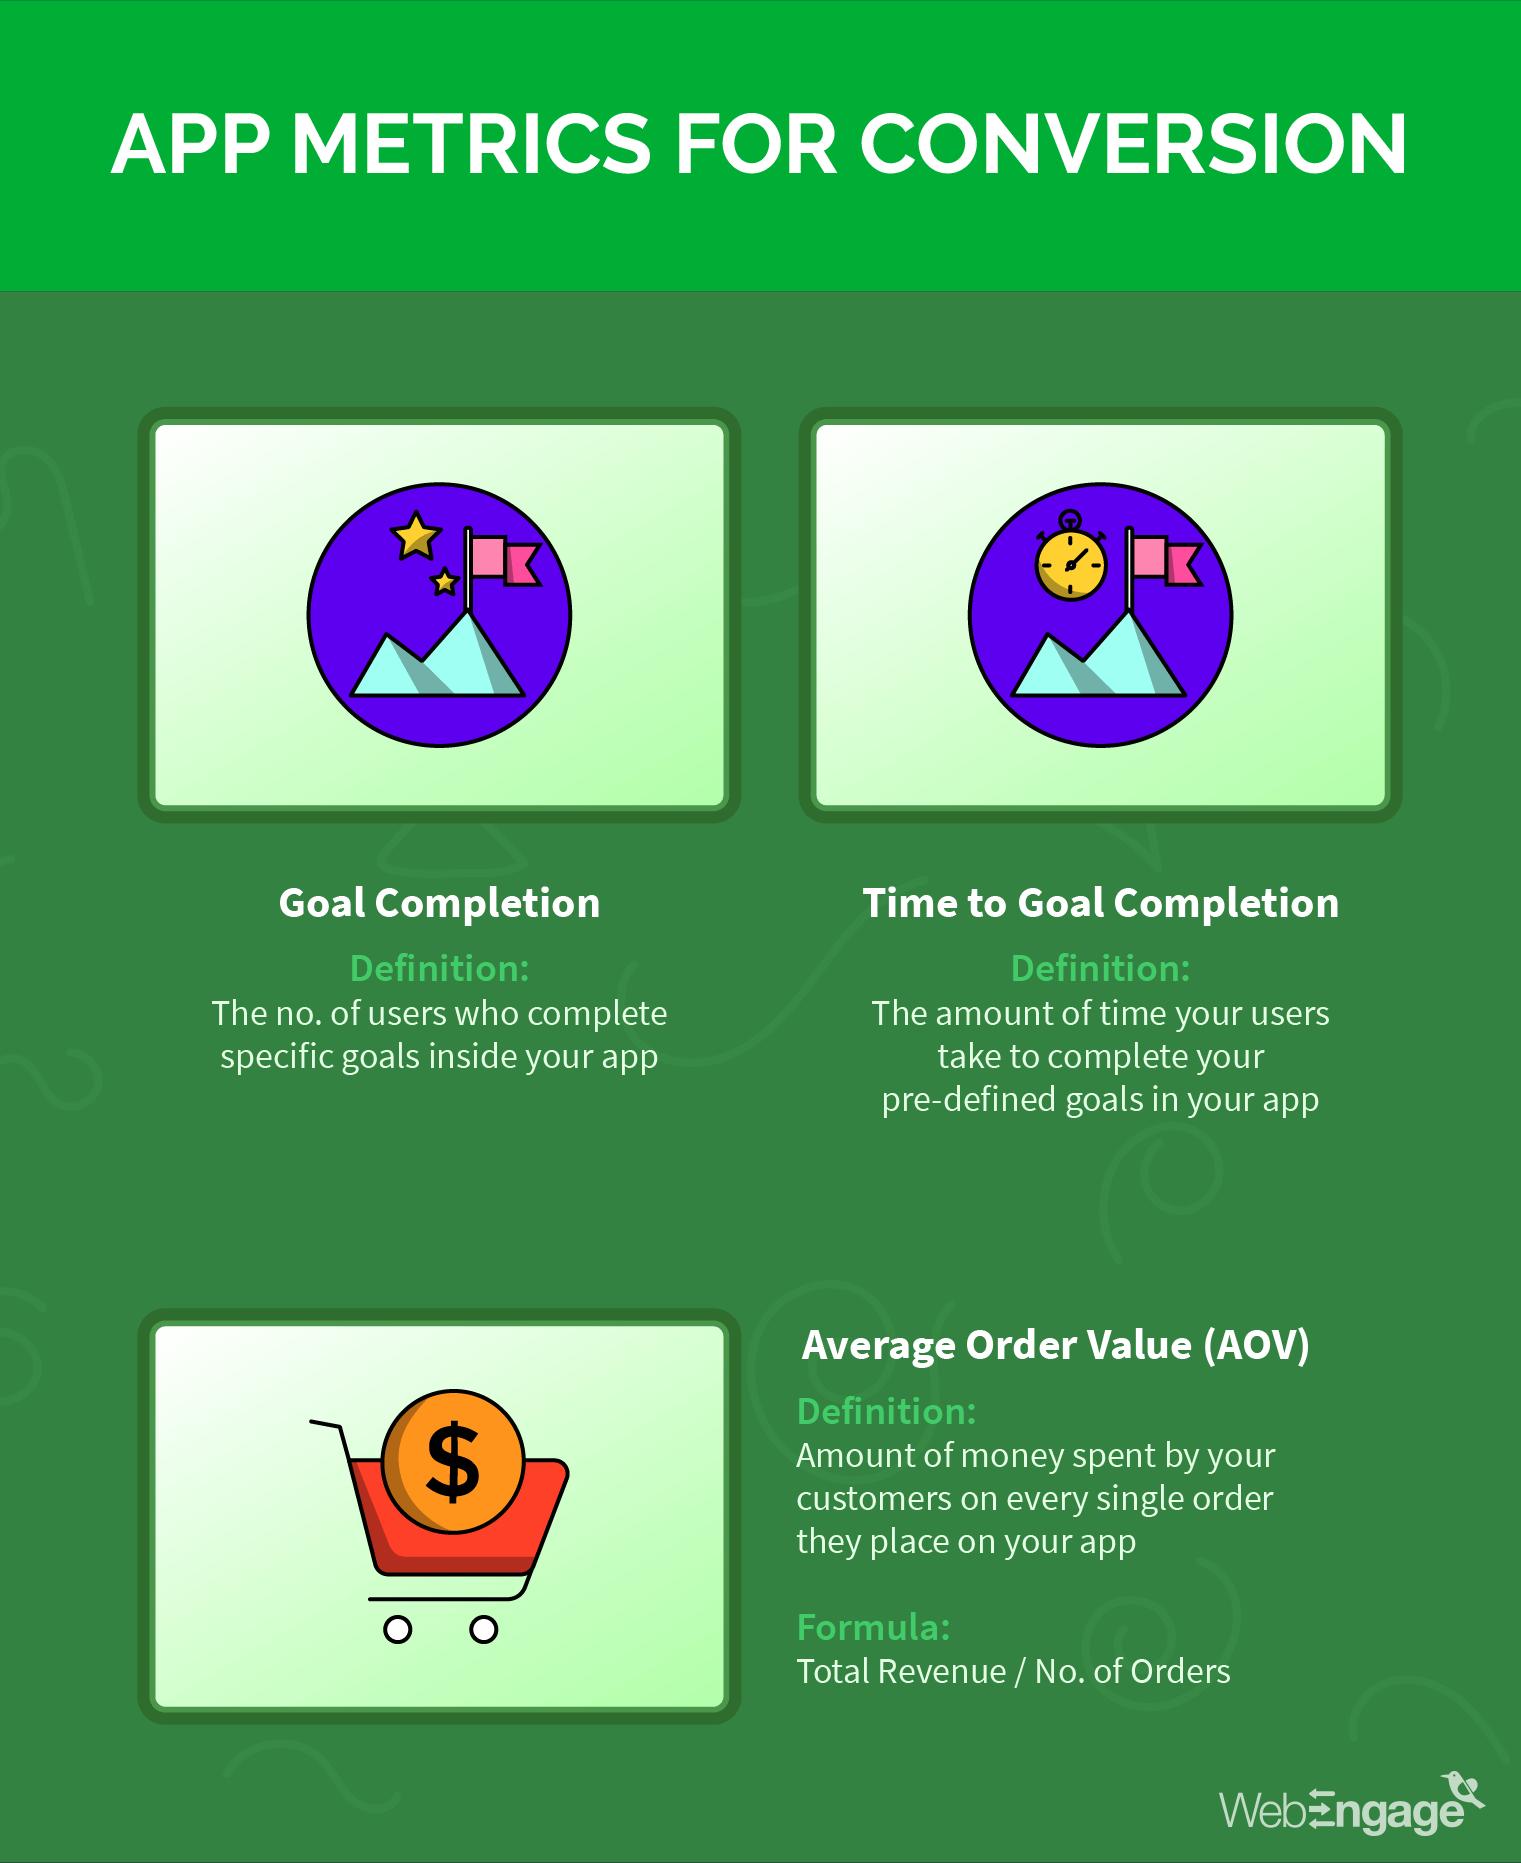 Mobile app metrics for conversion